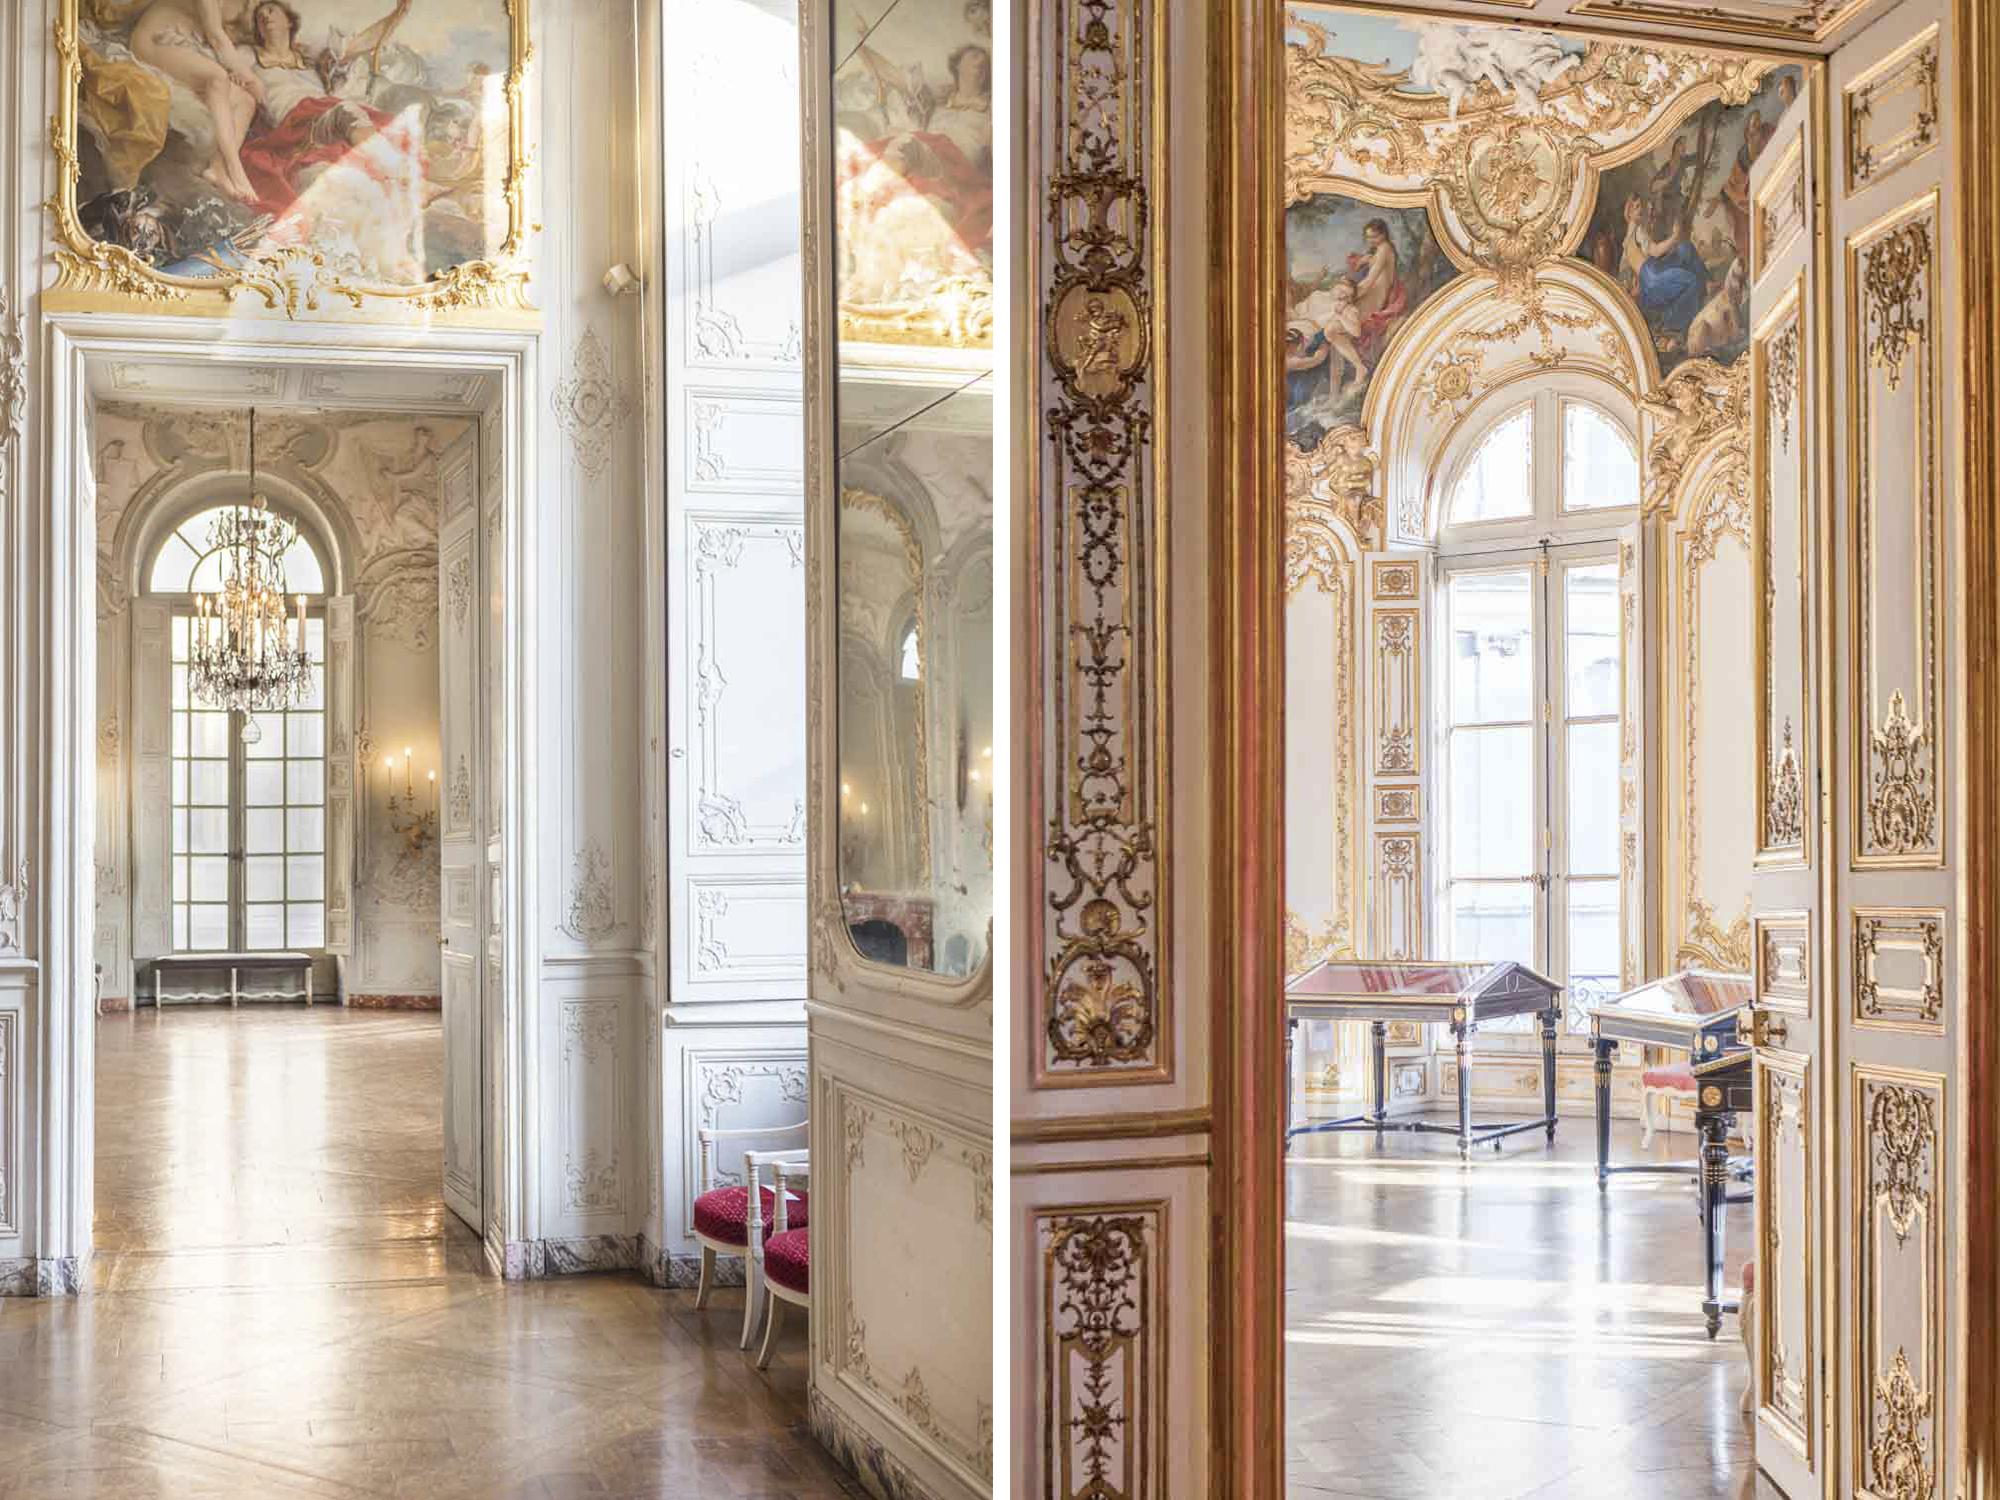 Soubise hallways-2.jpg